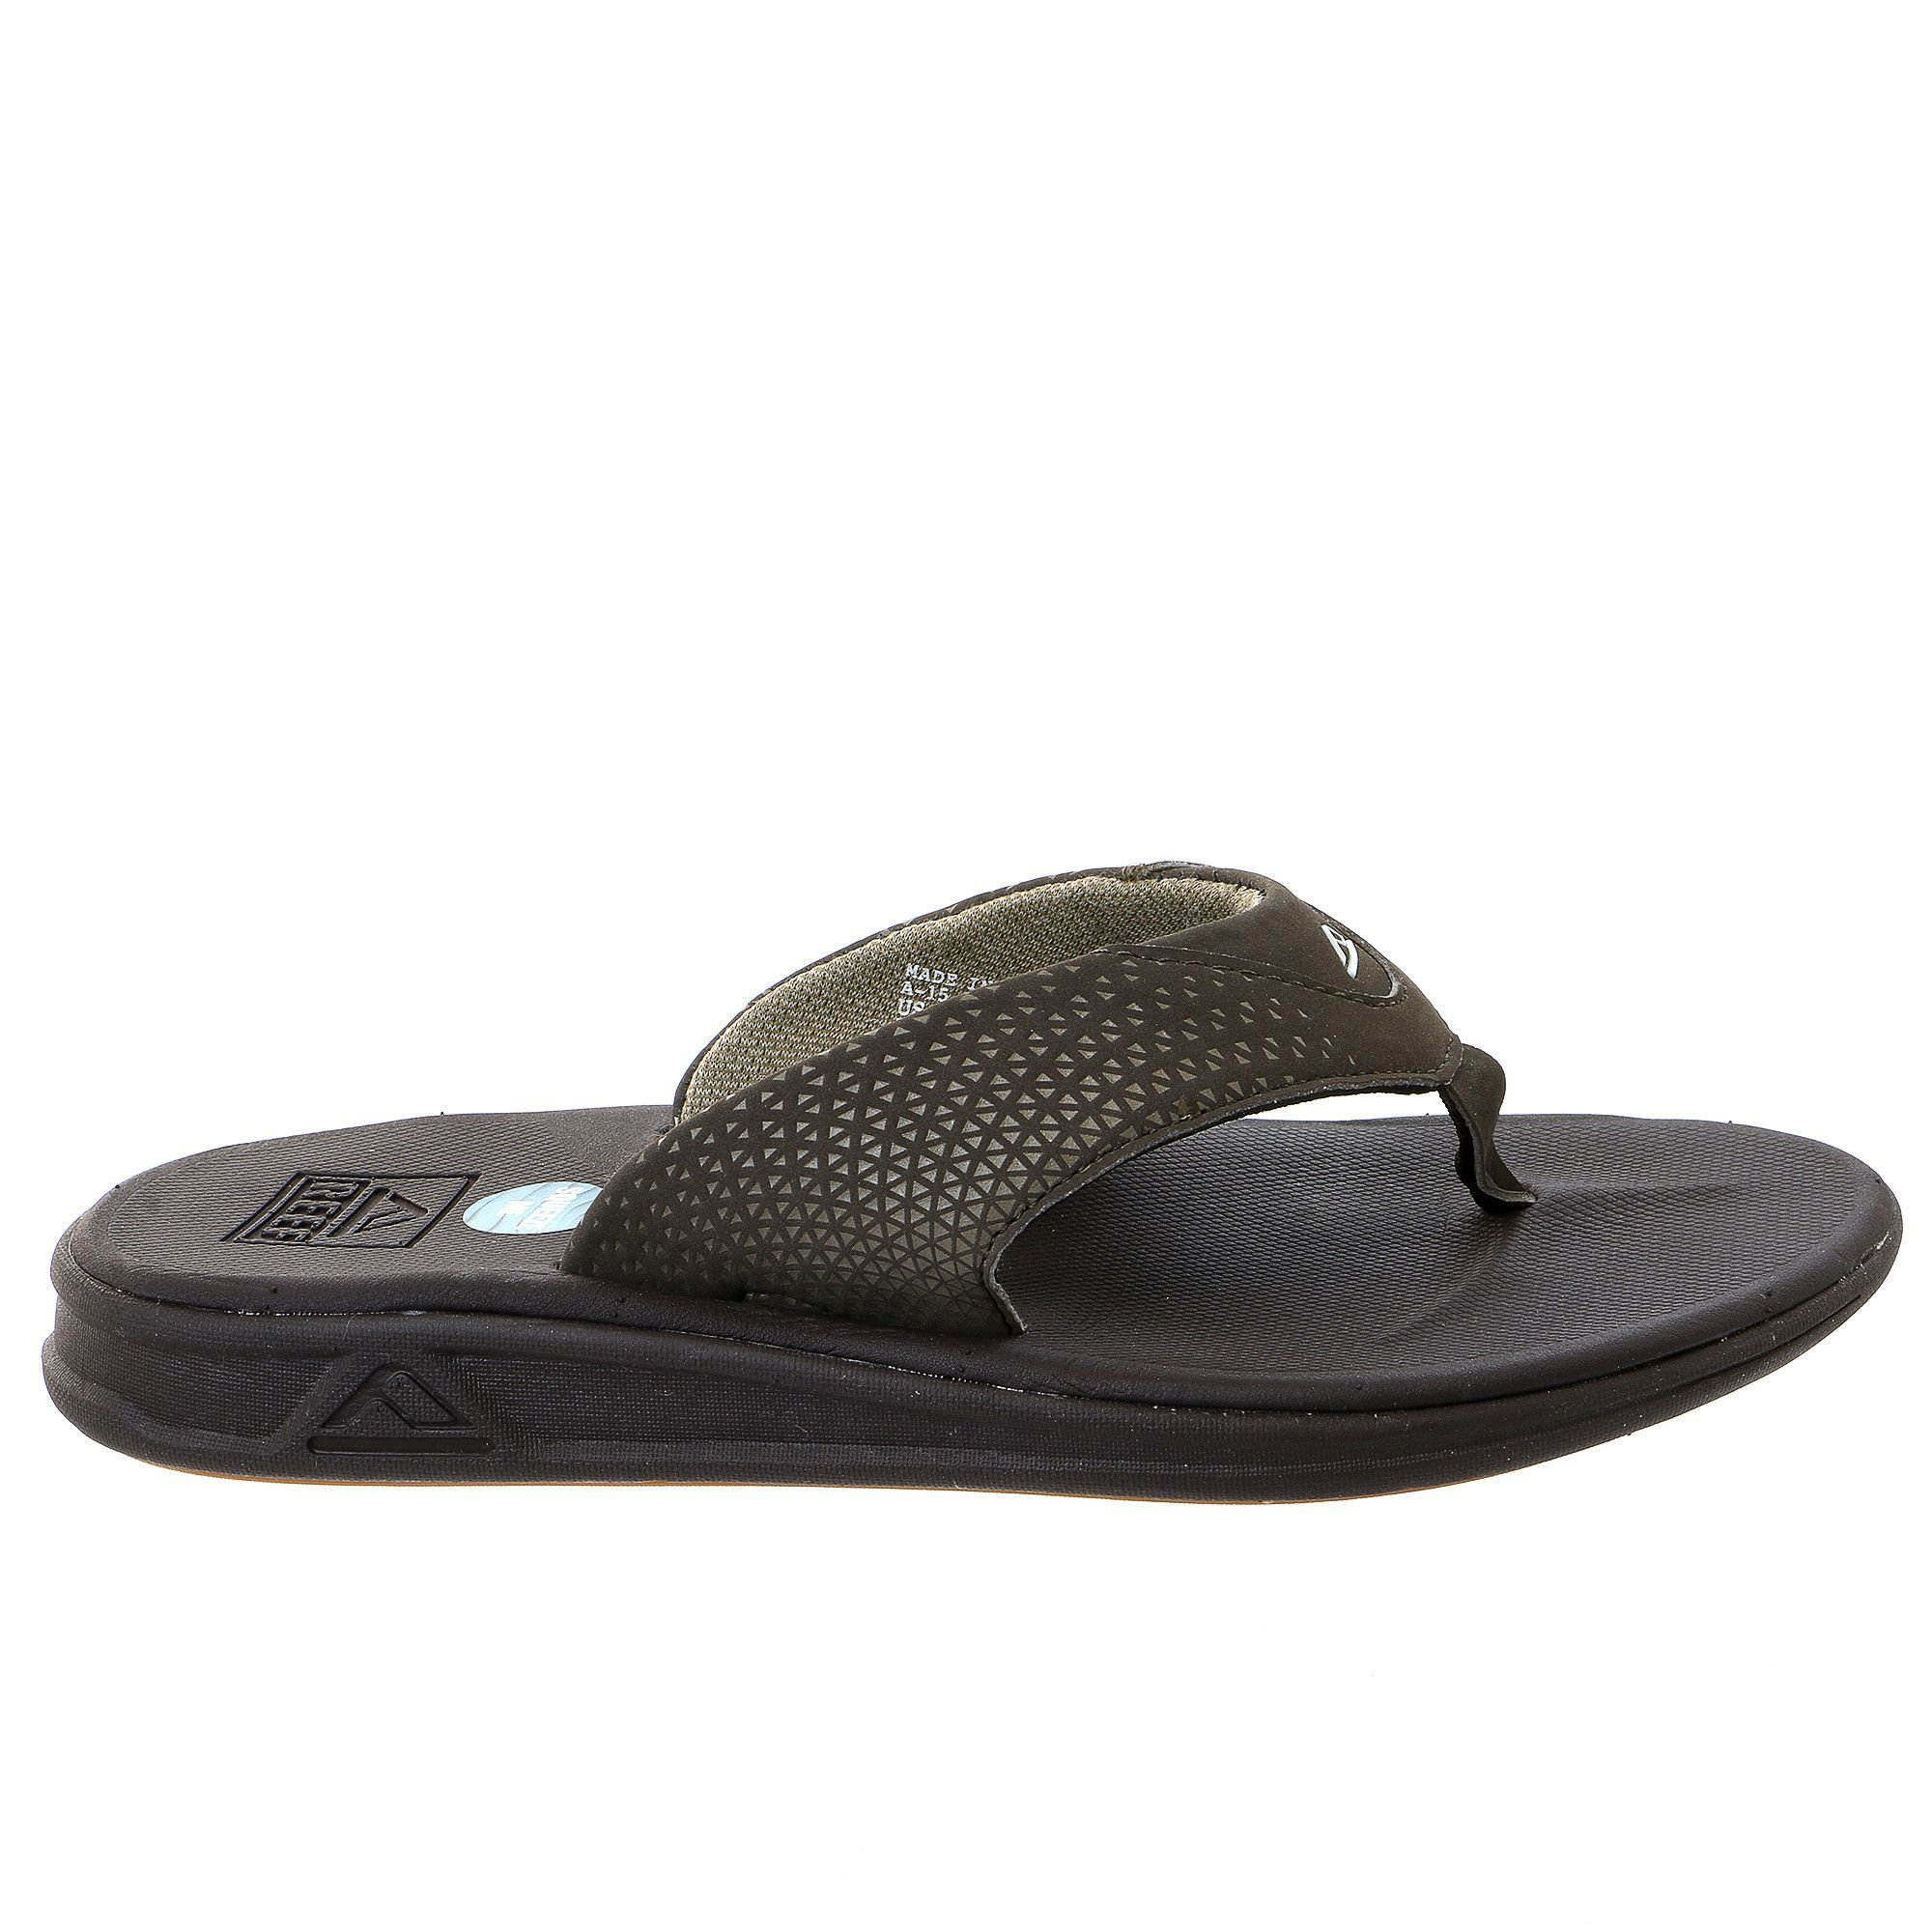 08bbfc12b4f3 Reef Rover Thong Flip Flop Sandal Shoe - Mens